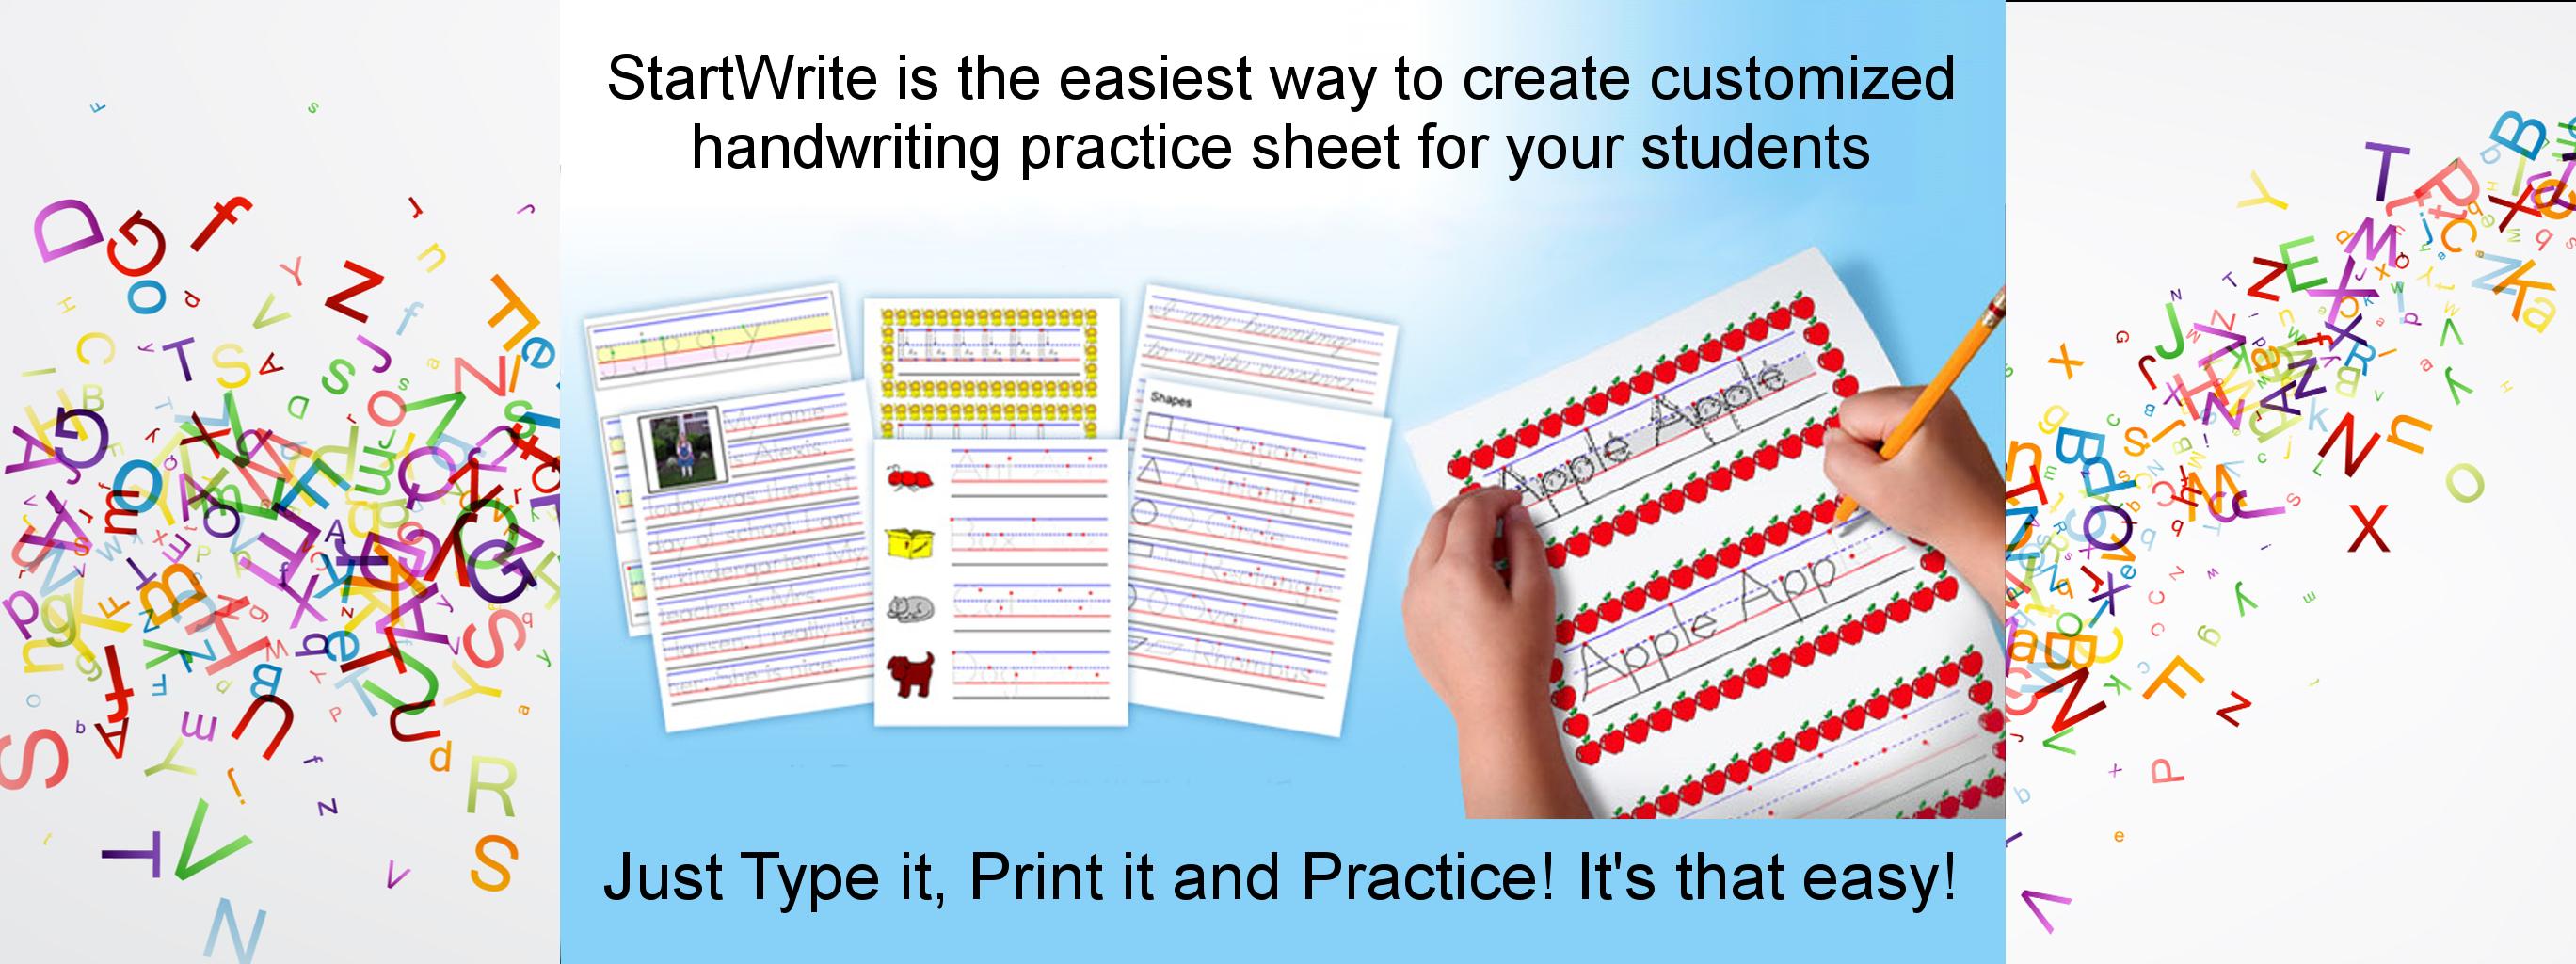 Handwriting Worksheet Maker From Www Startwrite Com Handwriting Analysis Handwriting Practice Sheets Improve Your Handwriting [ 1024 x 2737 Pixel ]